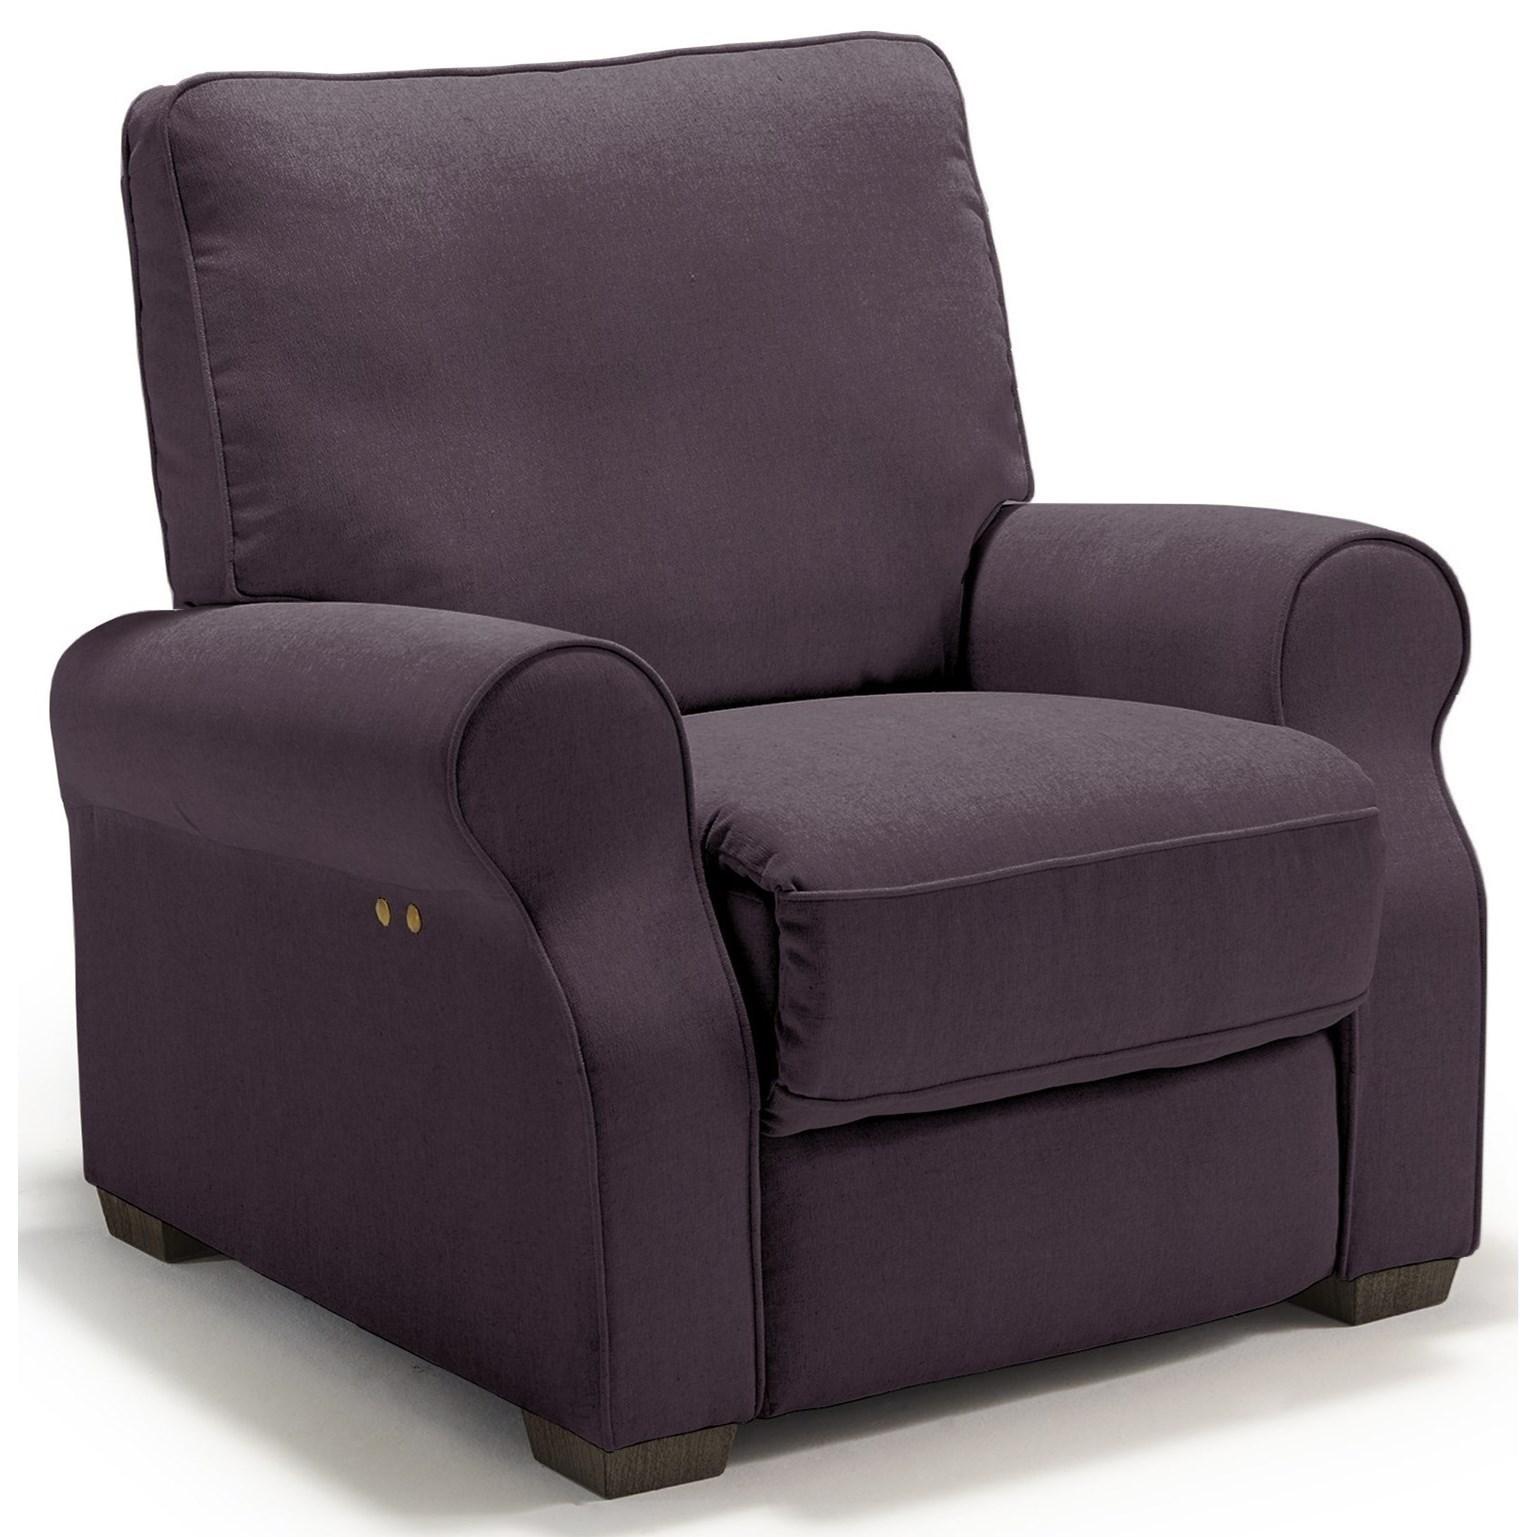 Best Home Furnishings Hattie High Leg Recliner - Item Number: -110006788-21168C